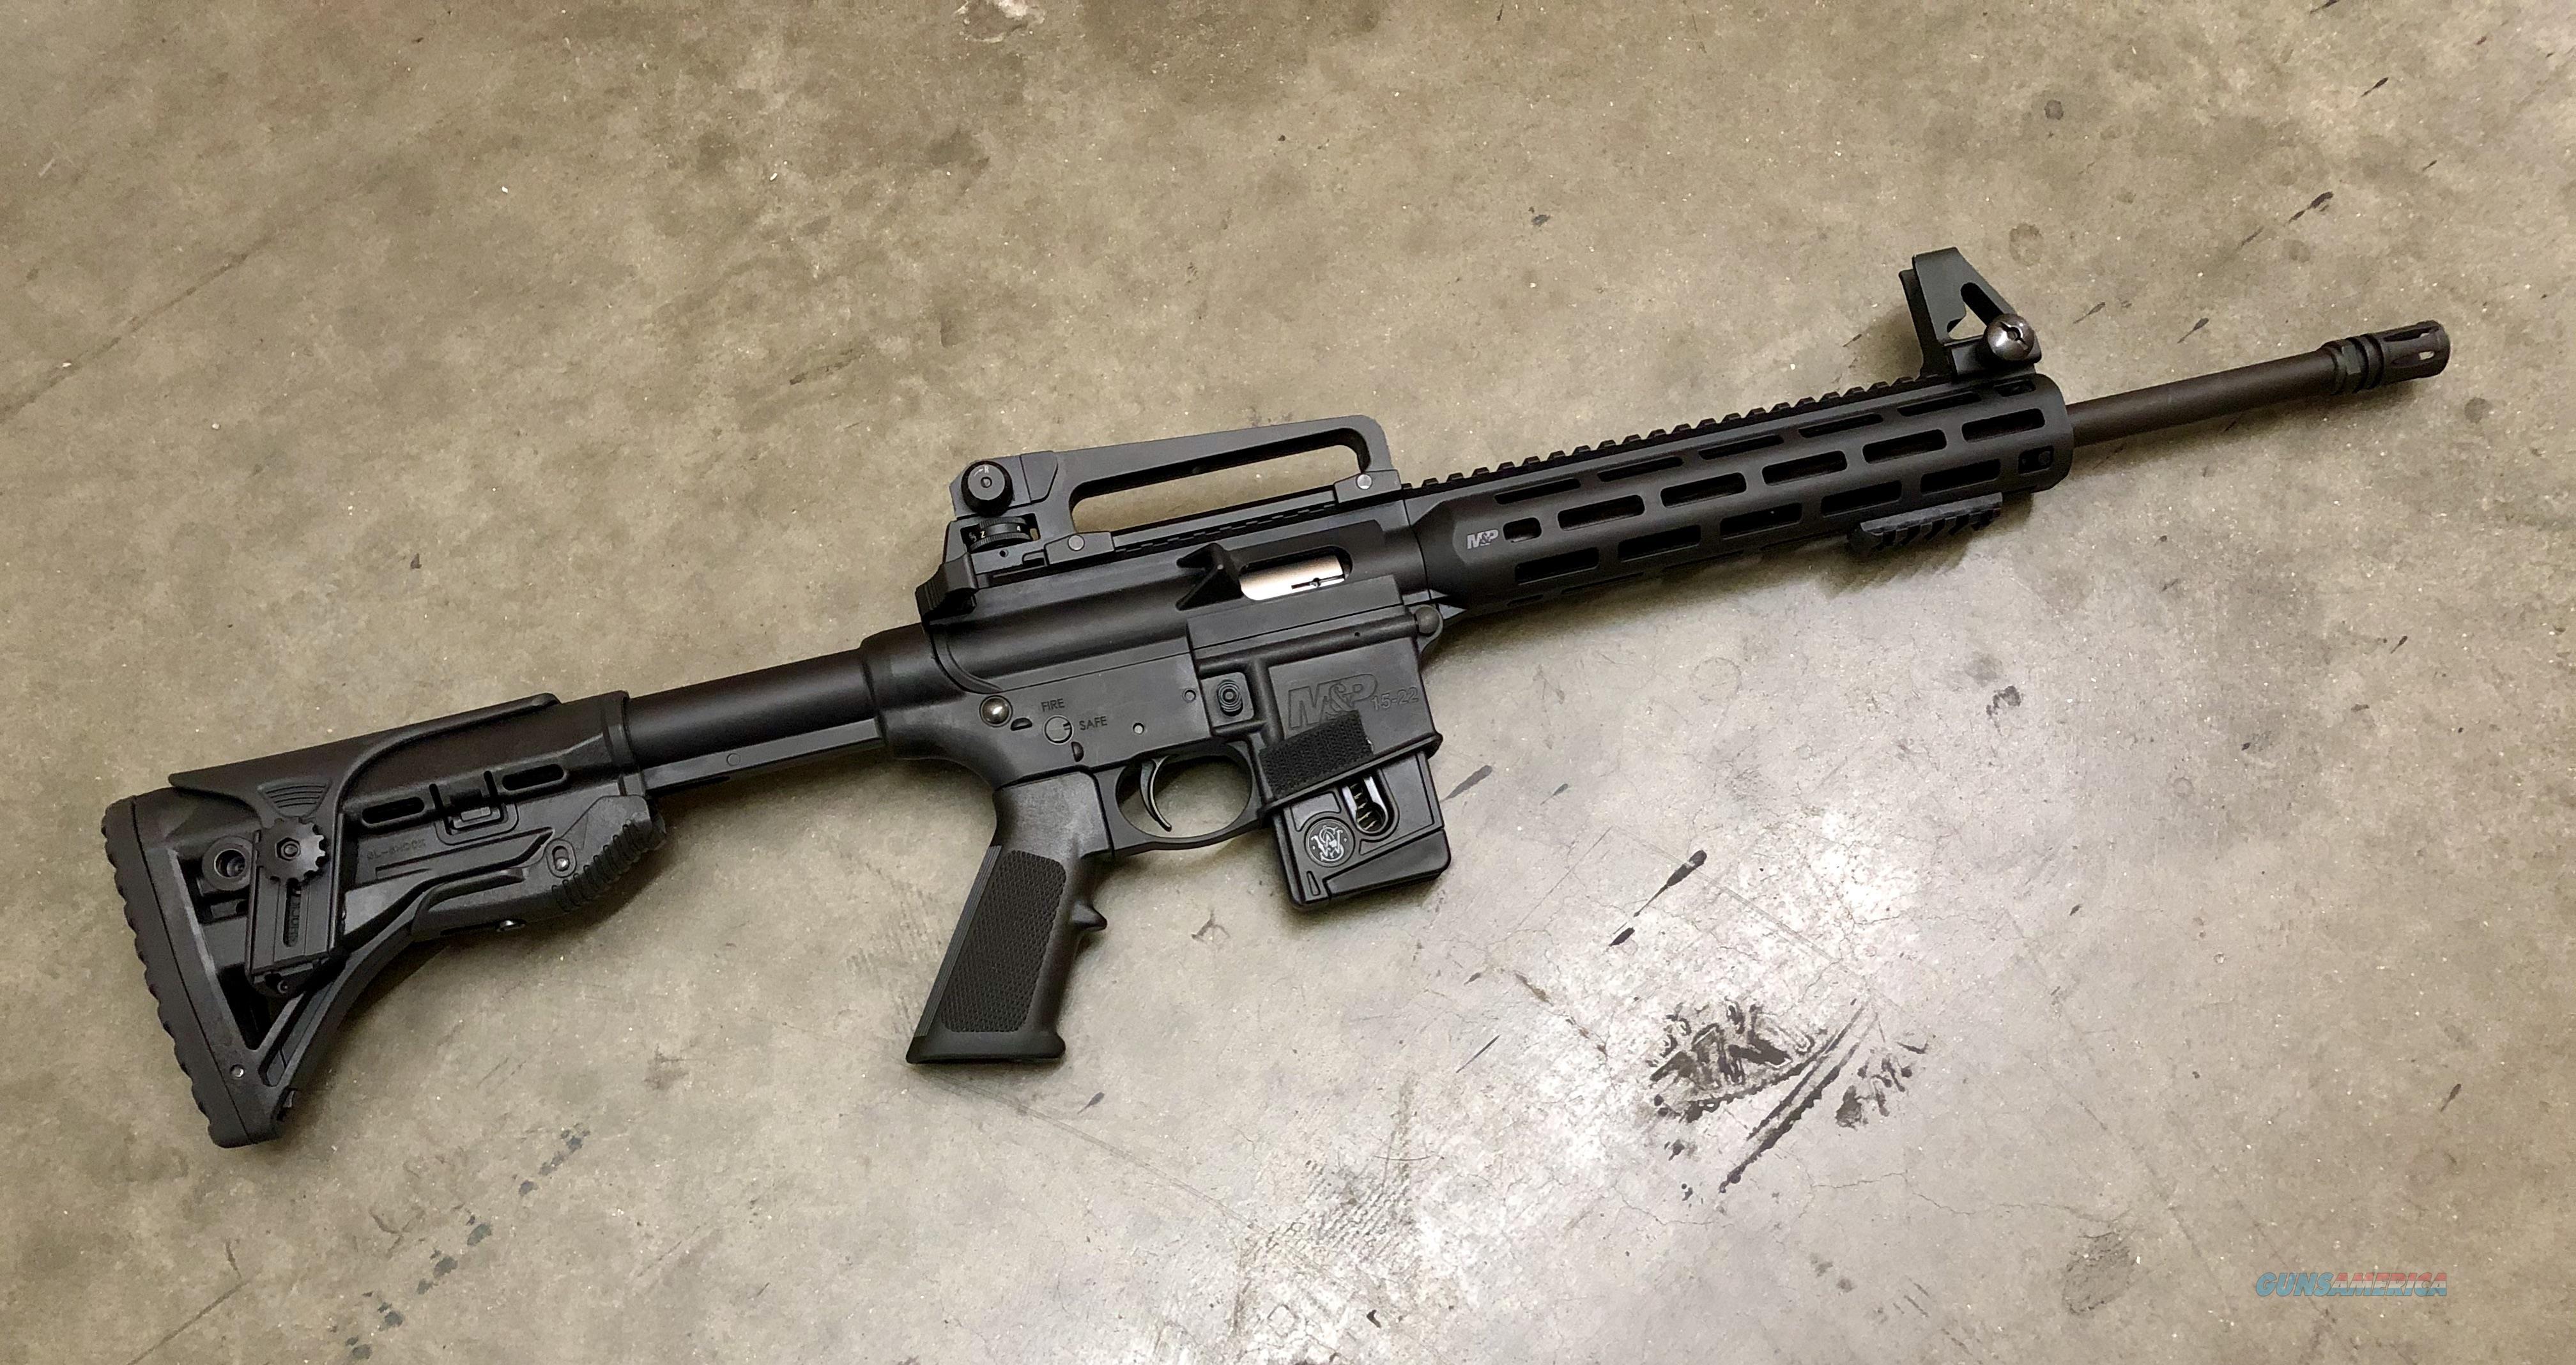 """Smith and Wesson"" M&P15 - 22LR (Sport Rifle)  Guns > Rifles > Smith & Wesson Rifles > M&P"